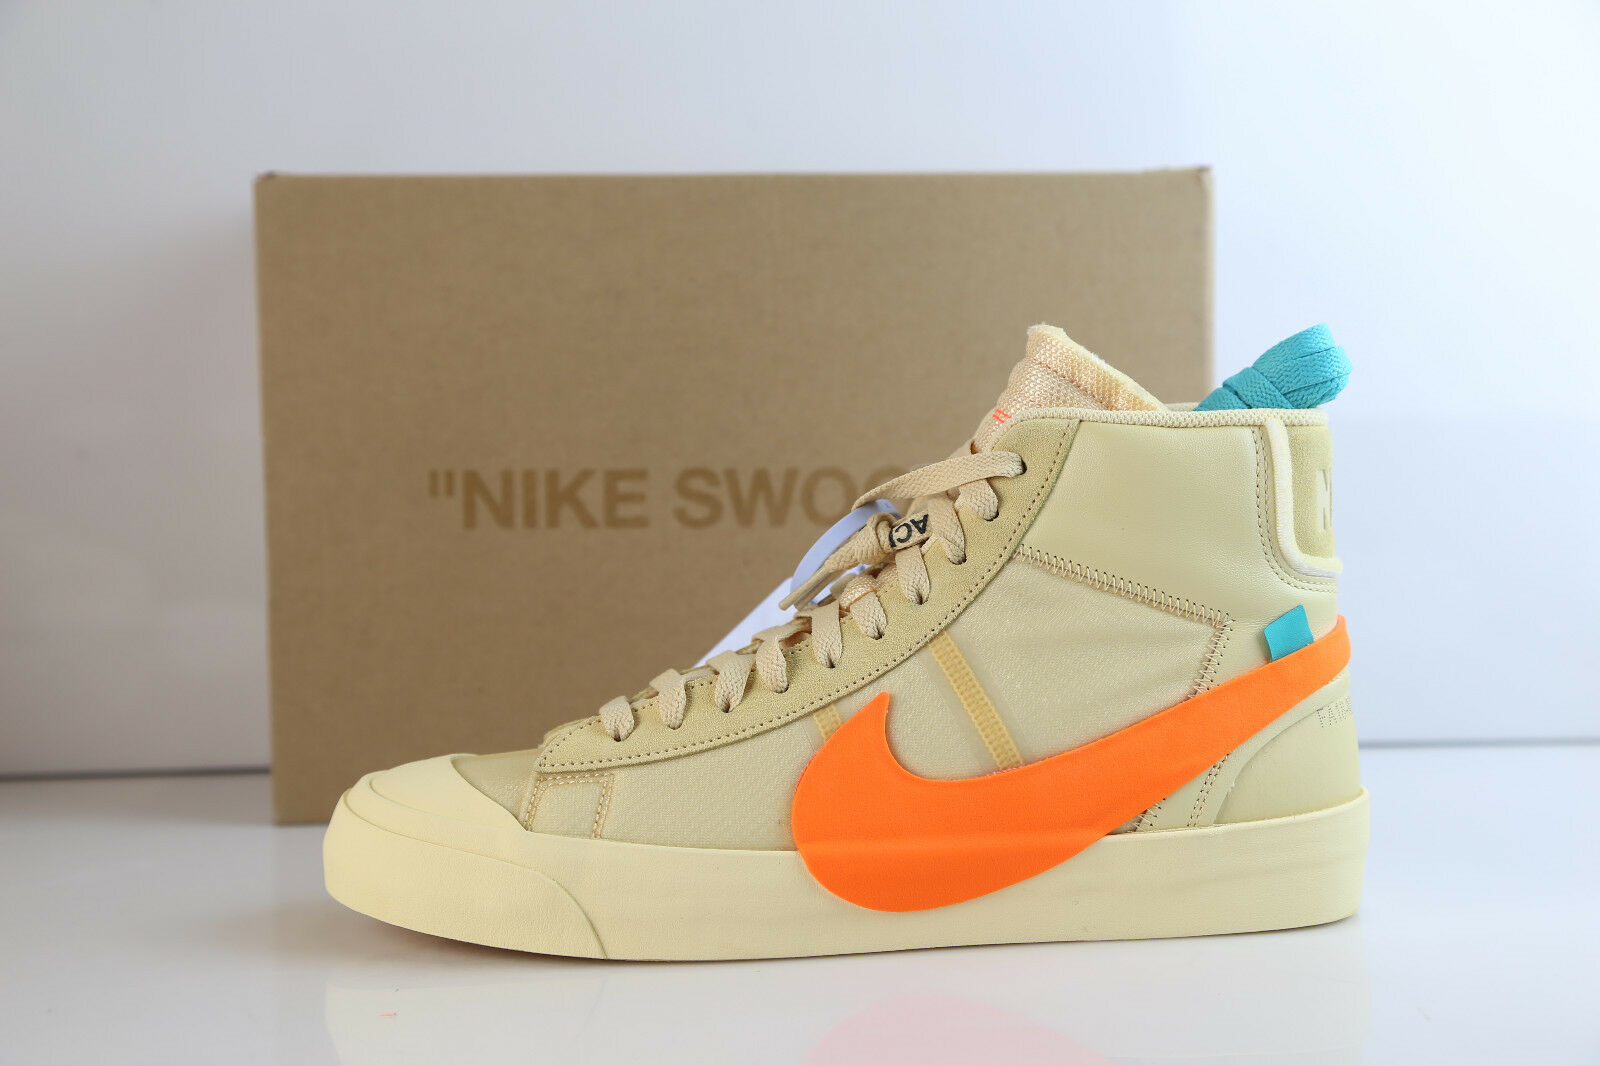 Nike Blazer Mid Off-White Virgil Hallows Eve Canvas Pale orange AA3832-700 8-13